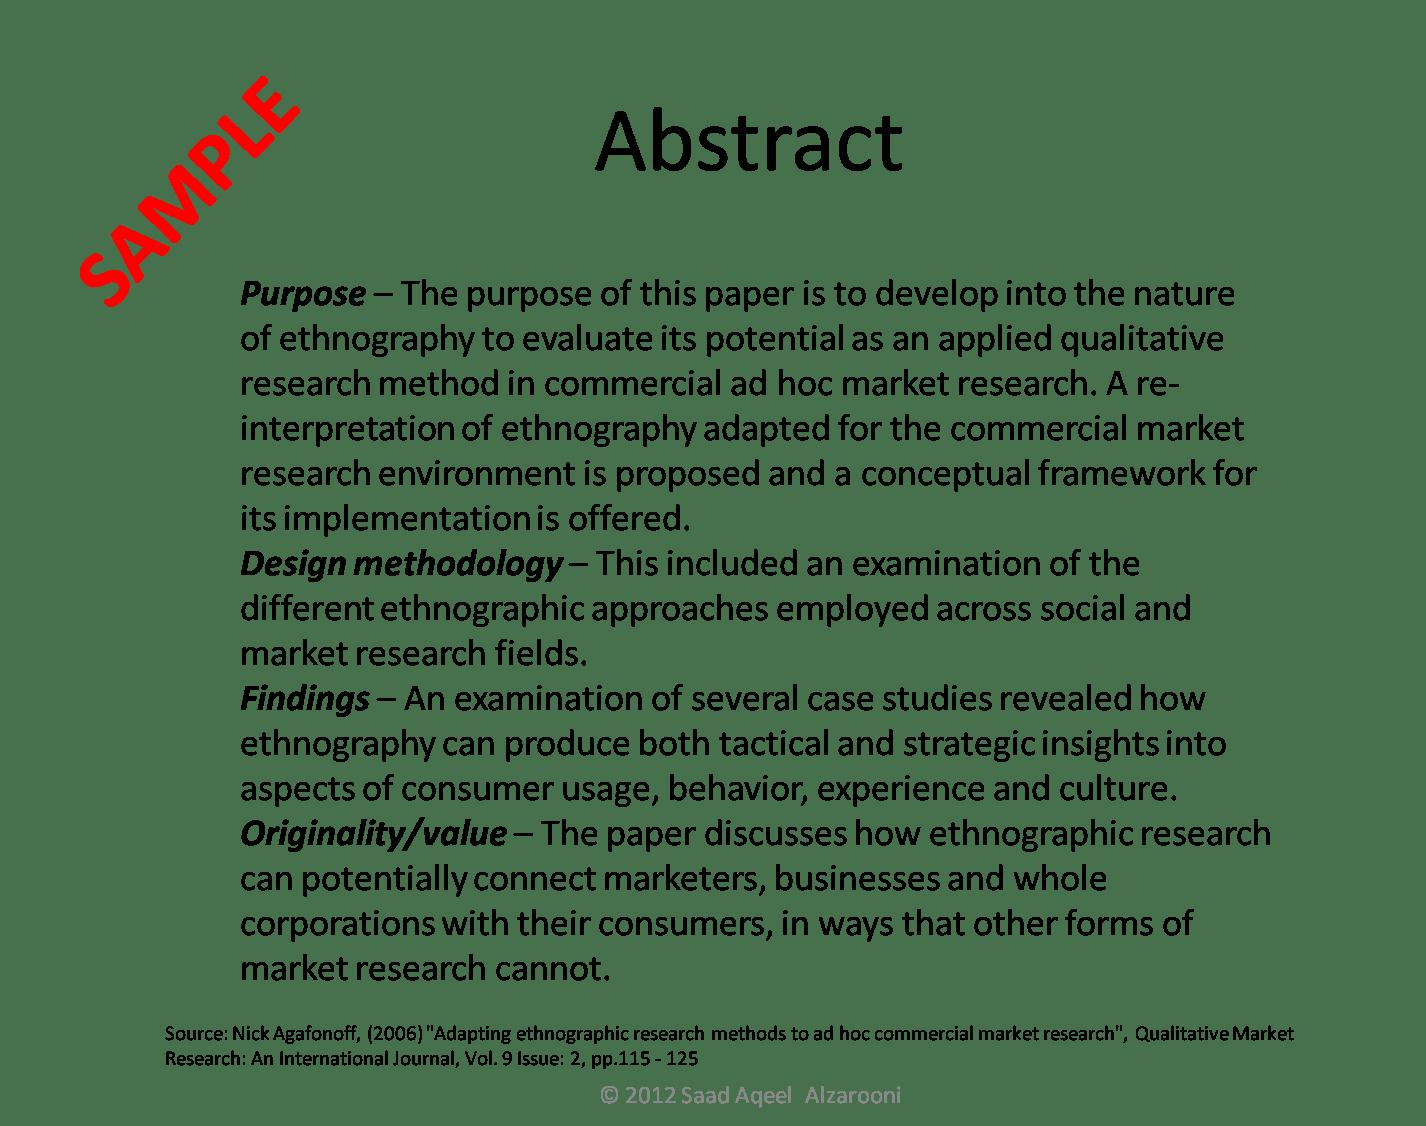 Essay Abstract Best Dissertation Proposal Ghostwriter Websites Uk